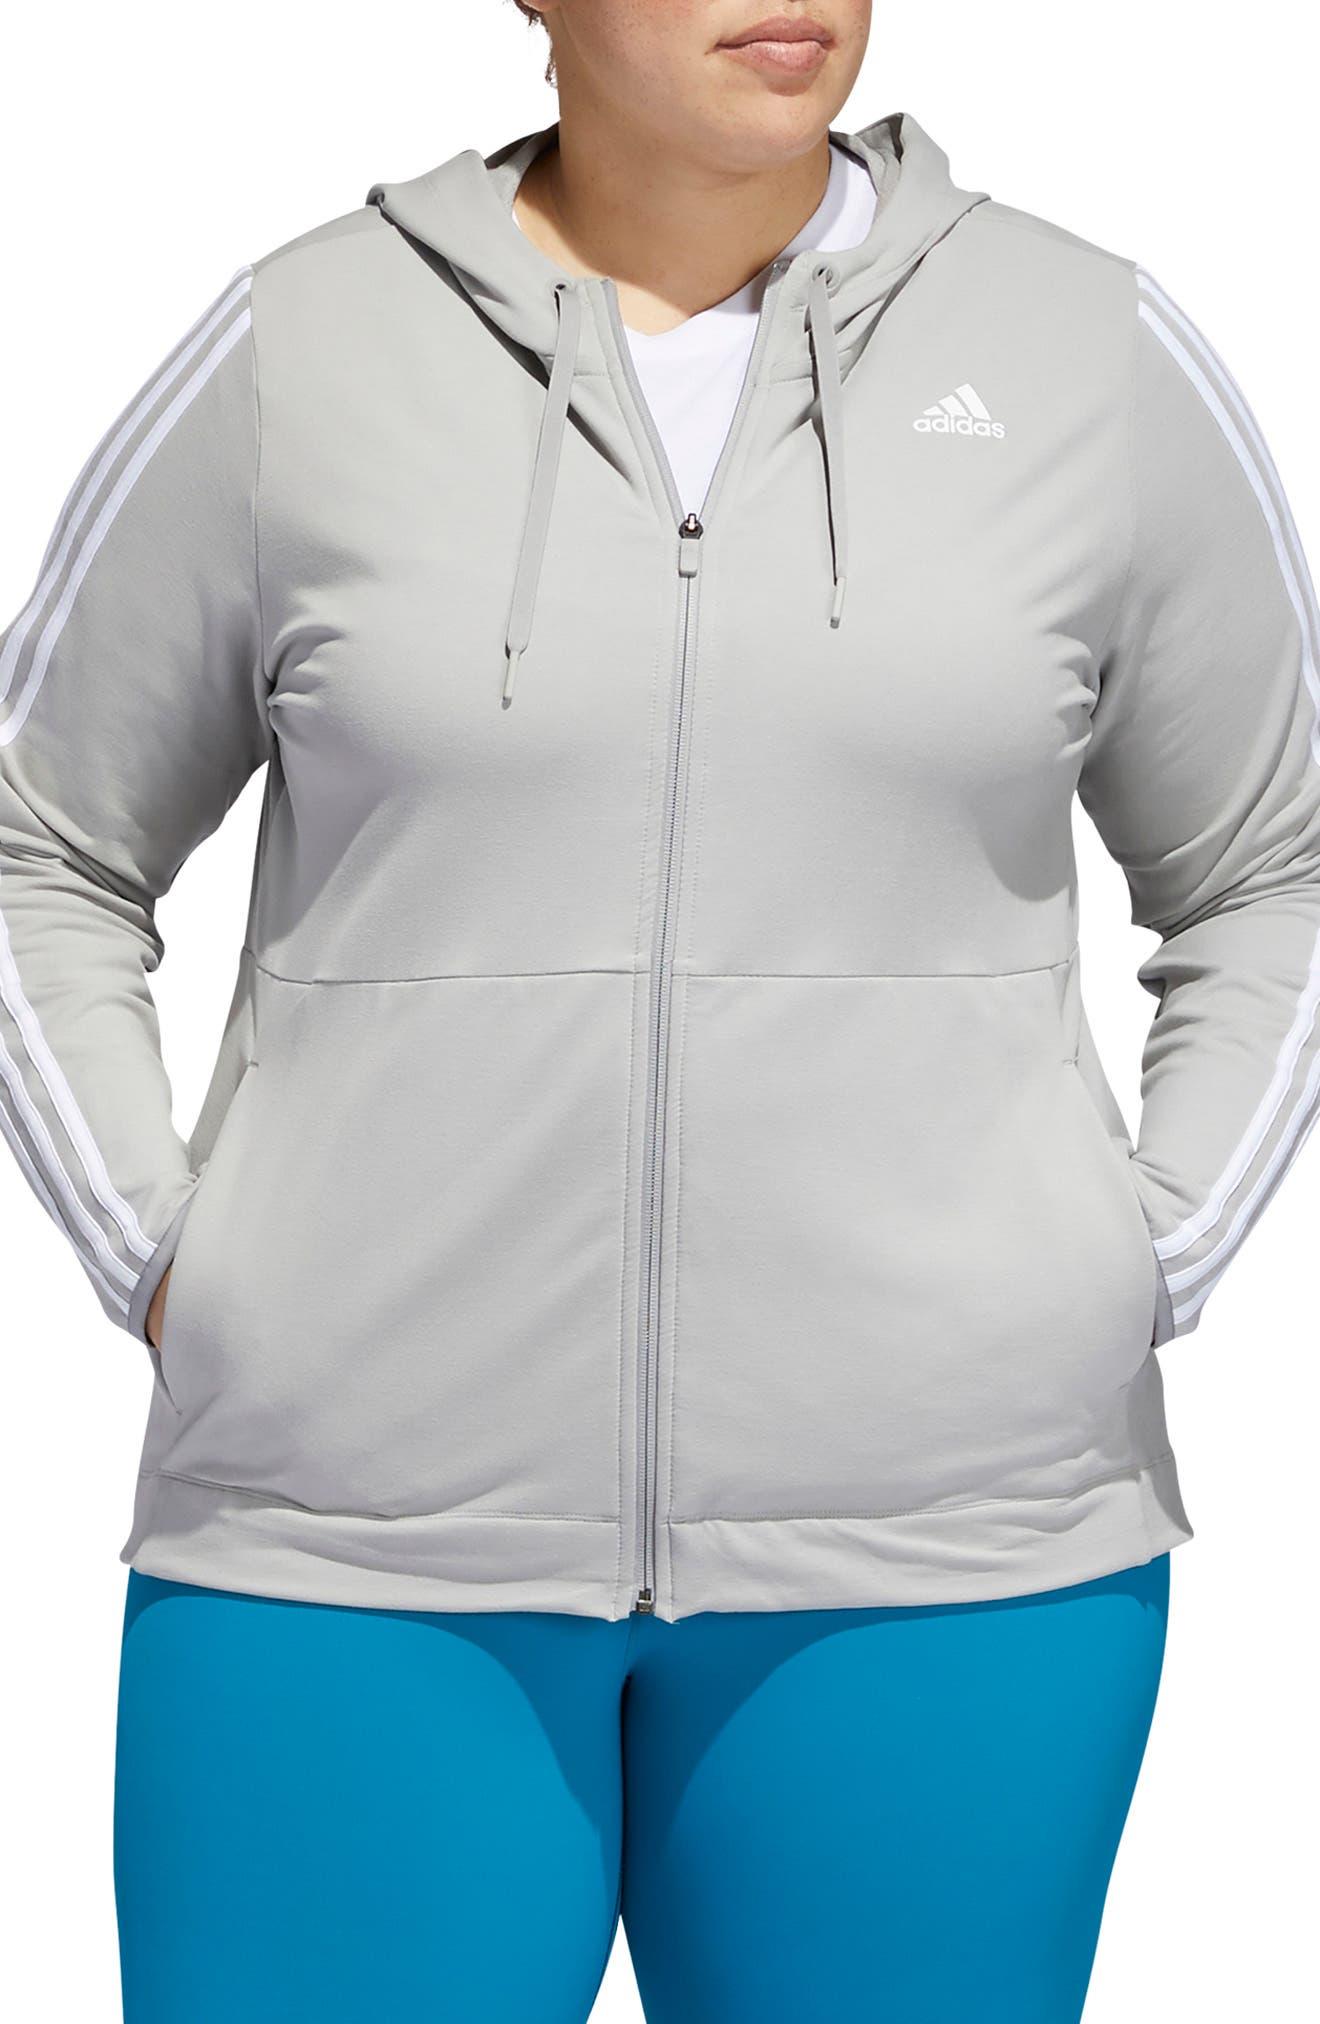 adidas j grphc hoodie - multco/grey/white